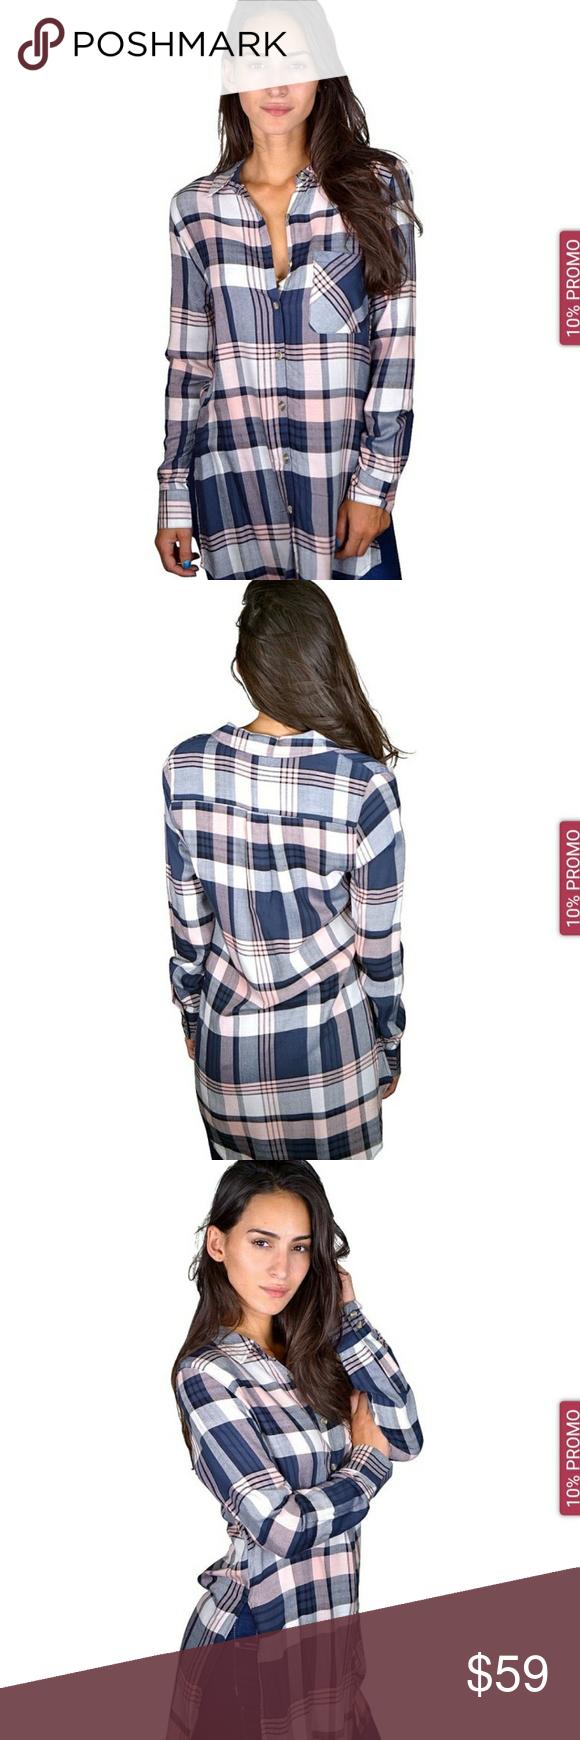 Flannel shirt ideas  Plaid Beauty Flannel Shirt  Ladies flannel shirts Flannel shirts